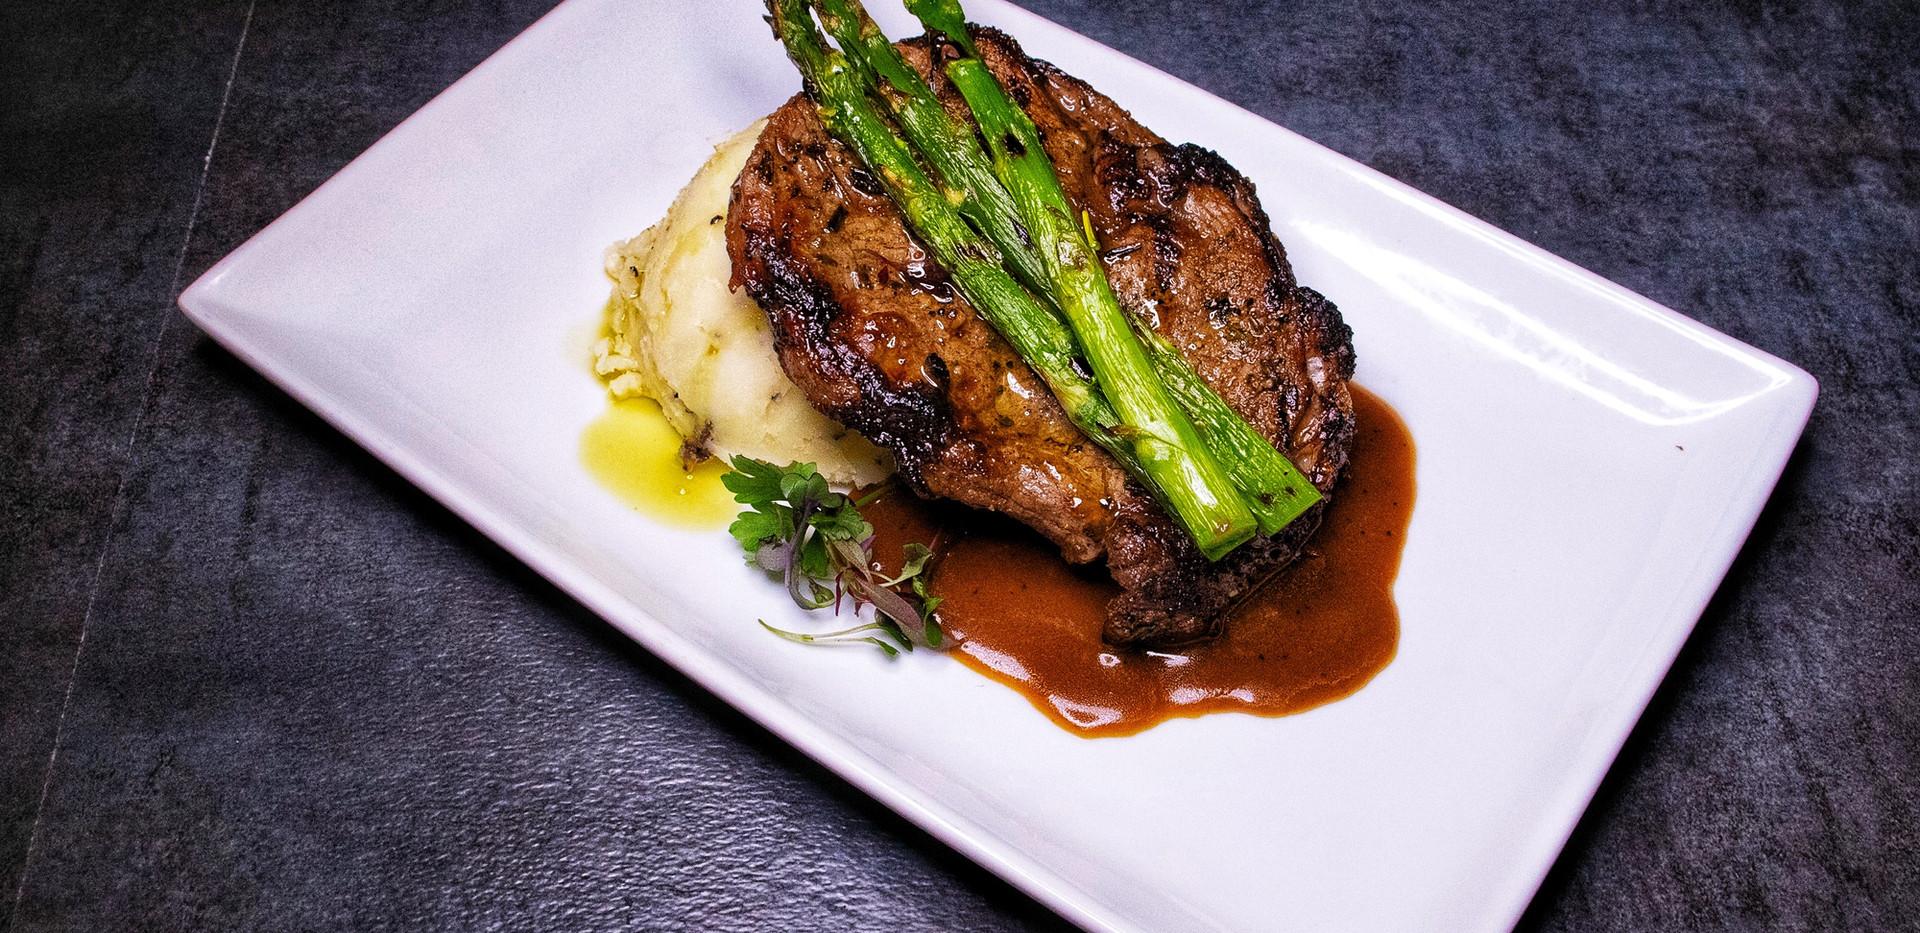 BAR  15oz Juicy Steak